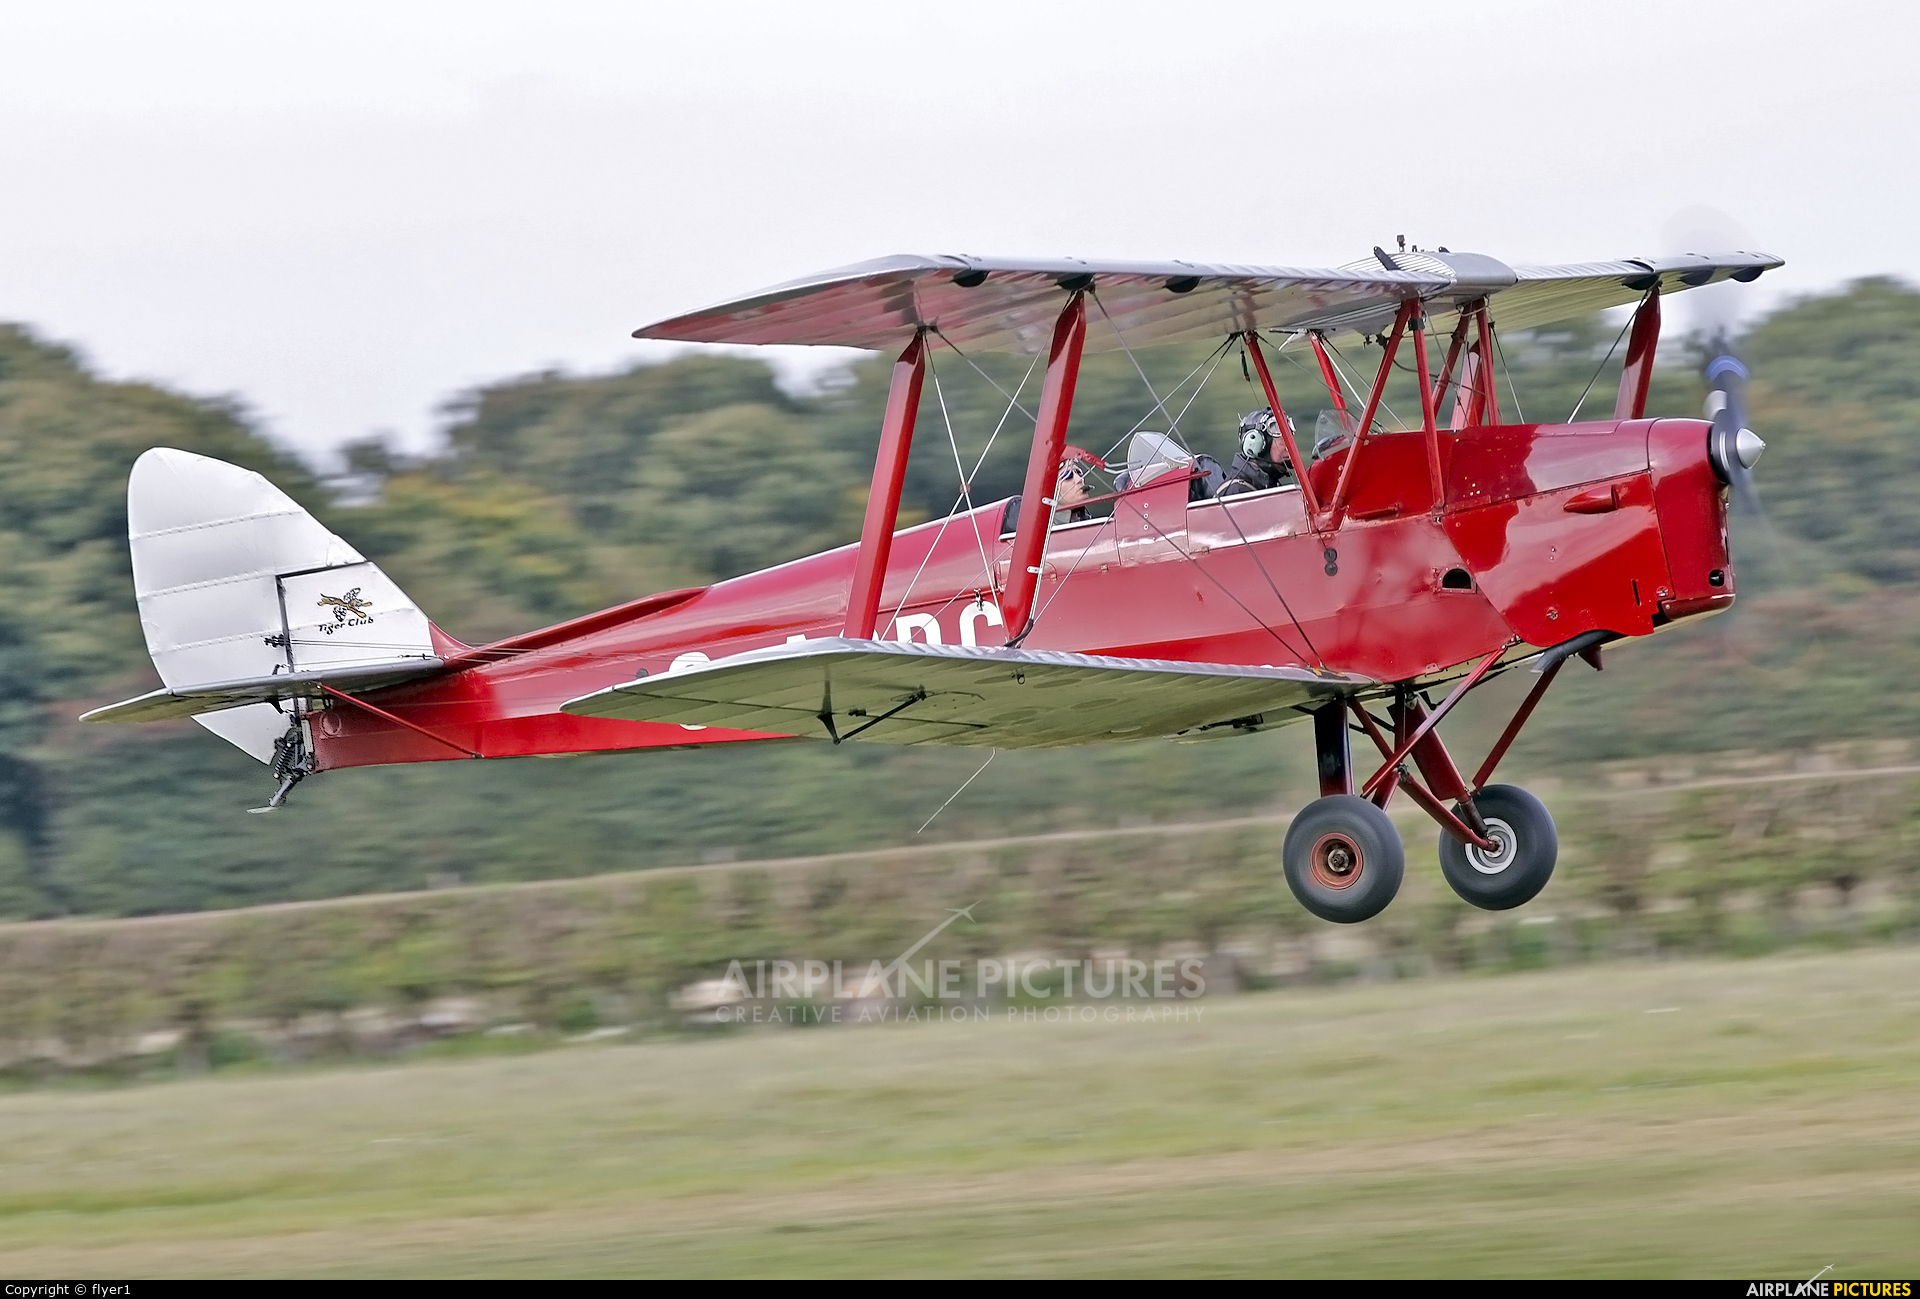 The Tiger Club G-ACDC aircraft at Lashenden / Headcorn